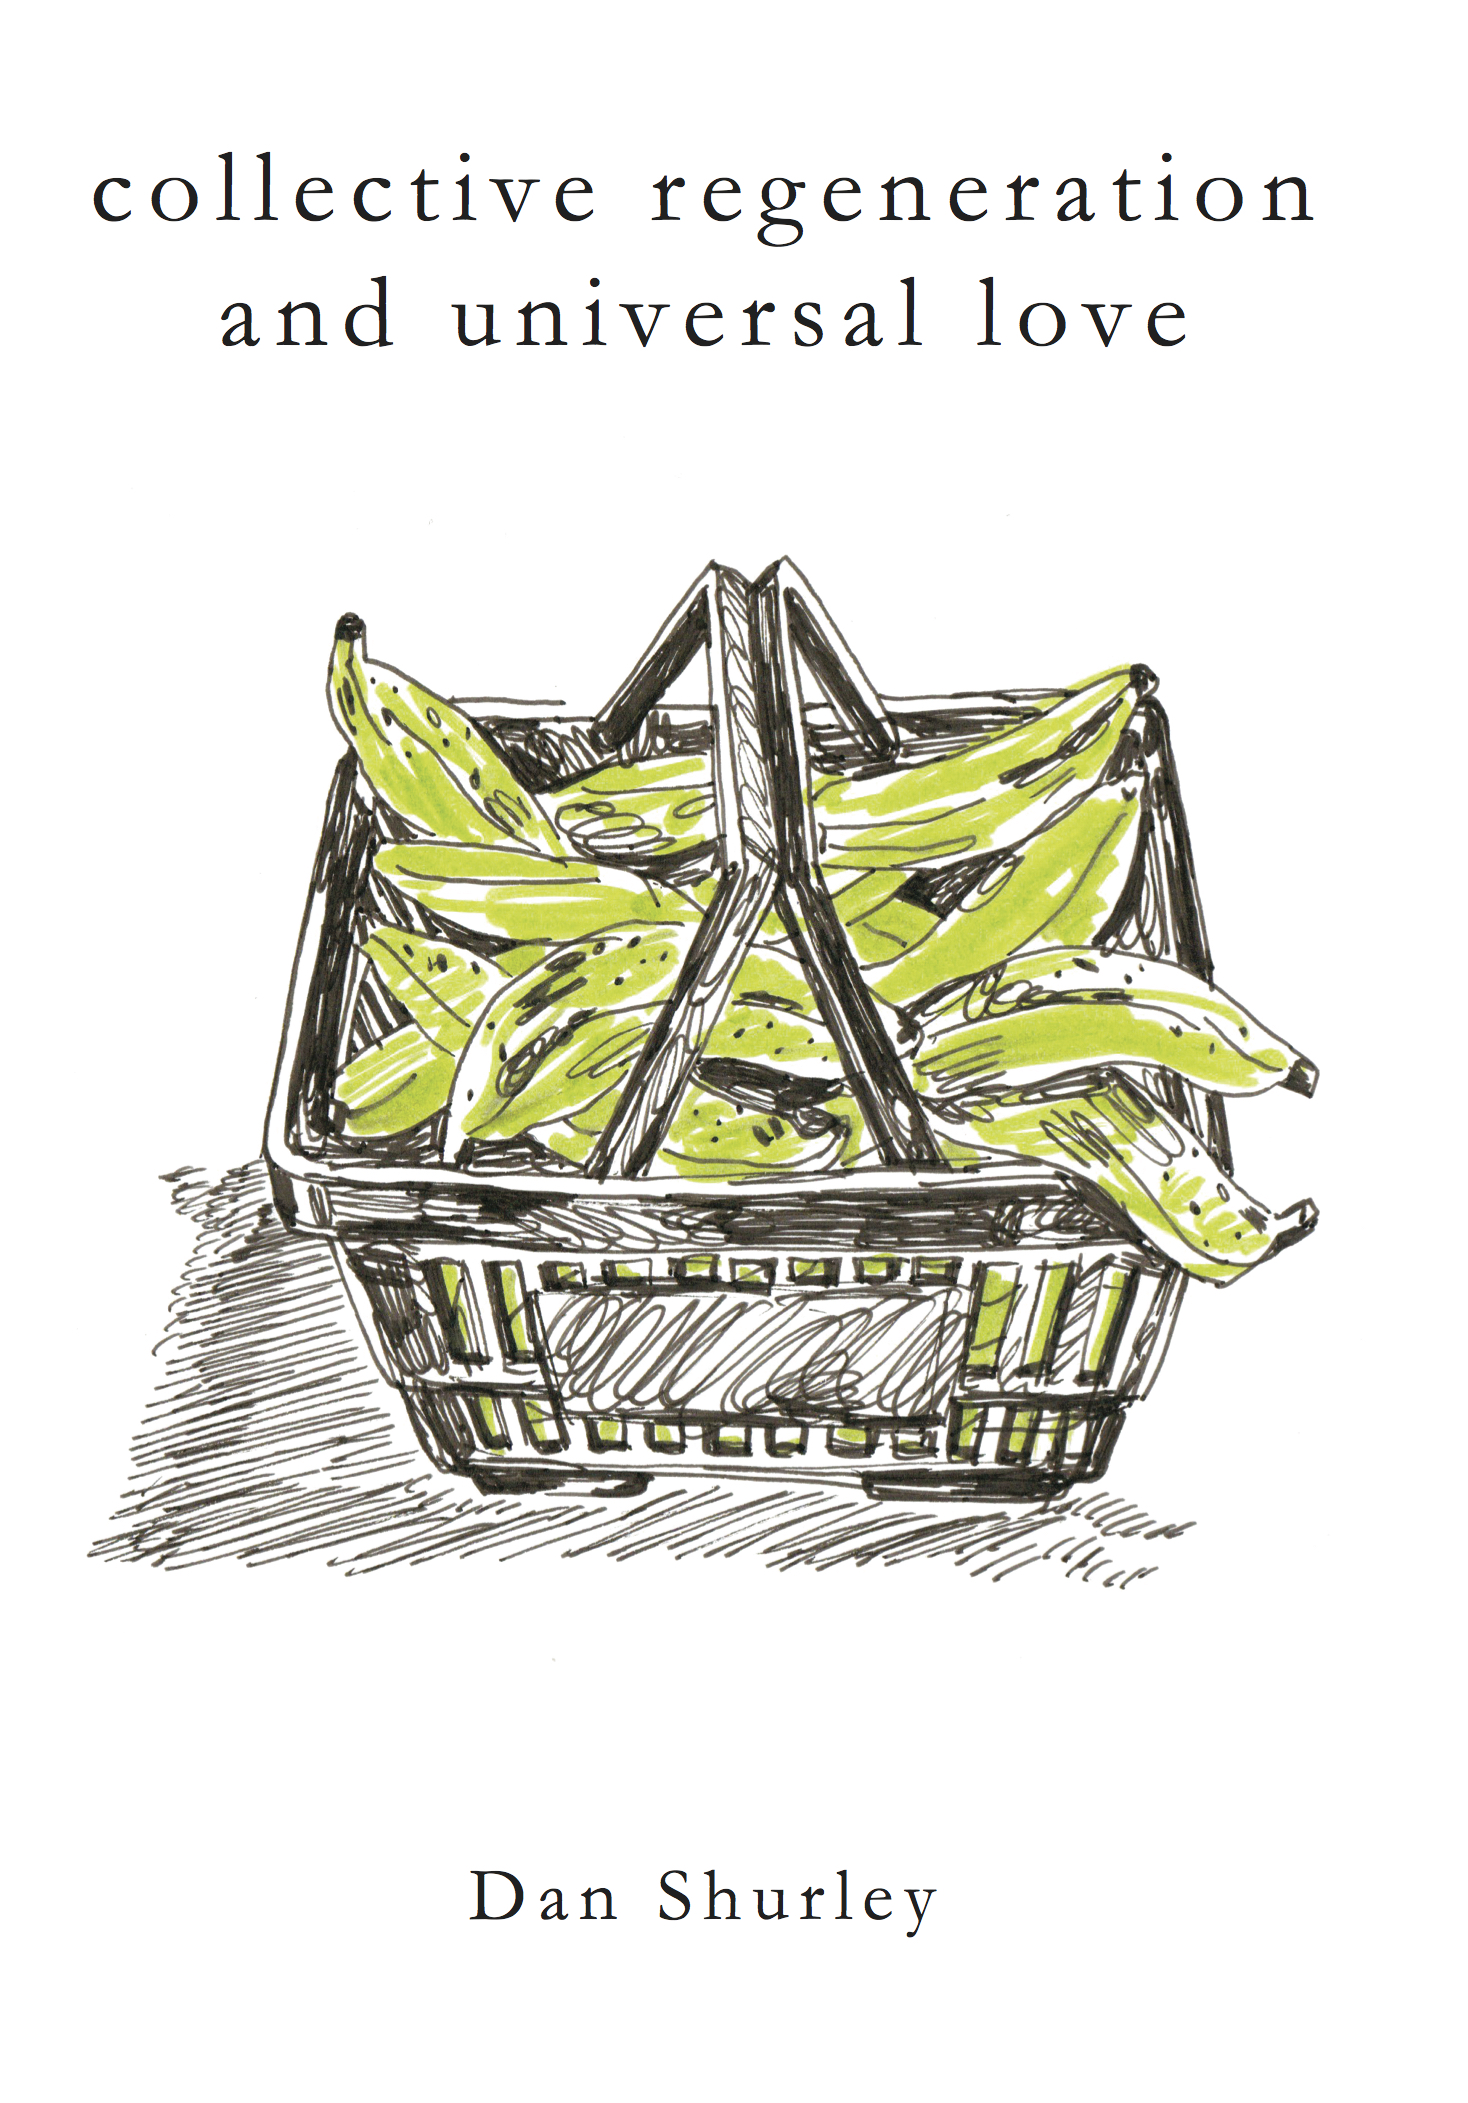 Dan Shurley Chapbook Cover 09.02.2015.jpg